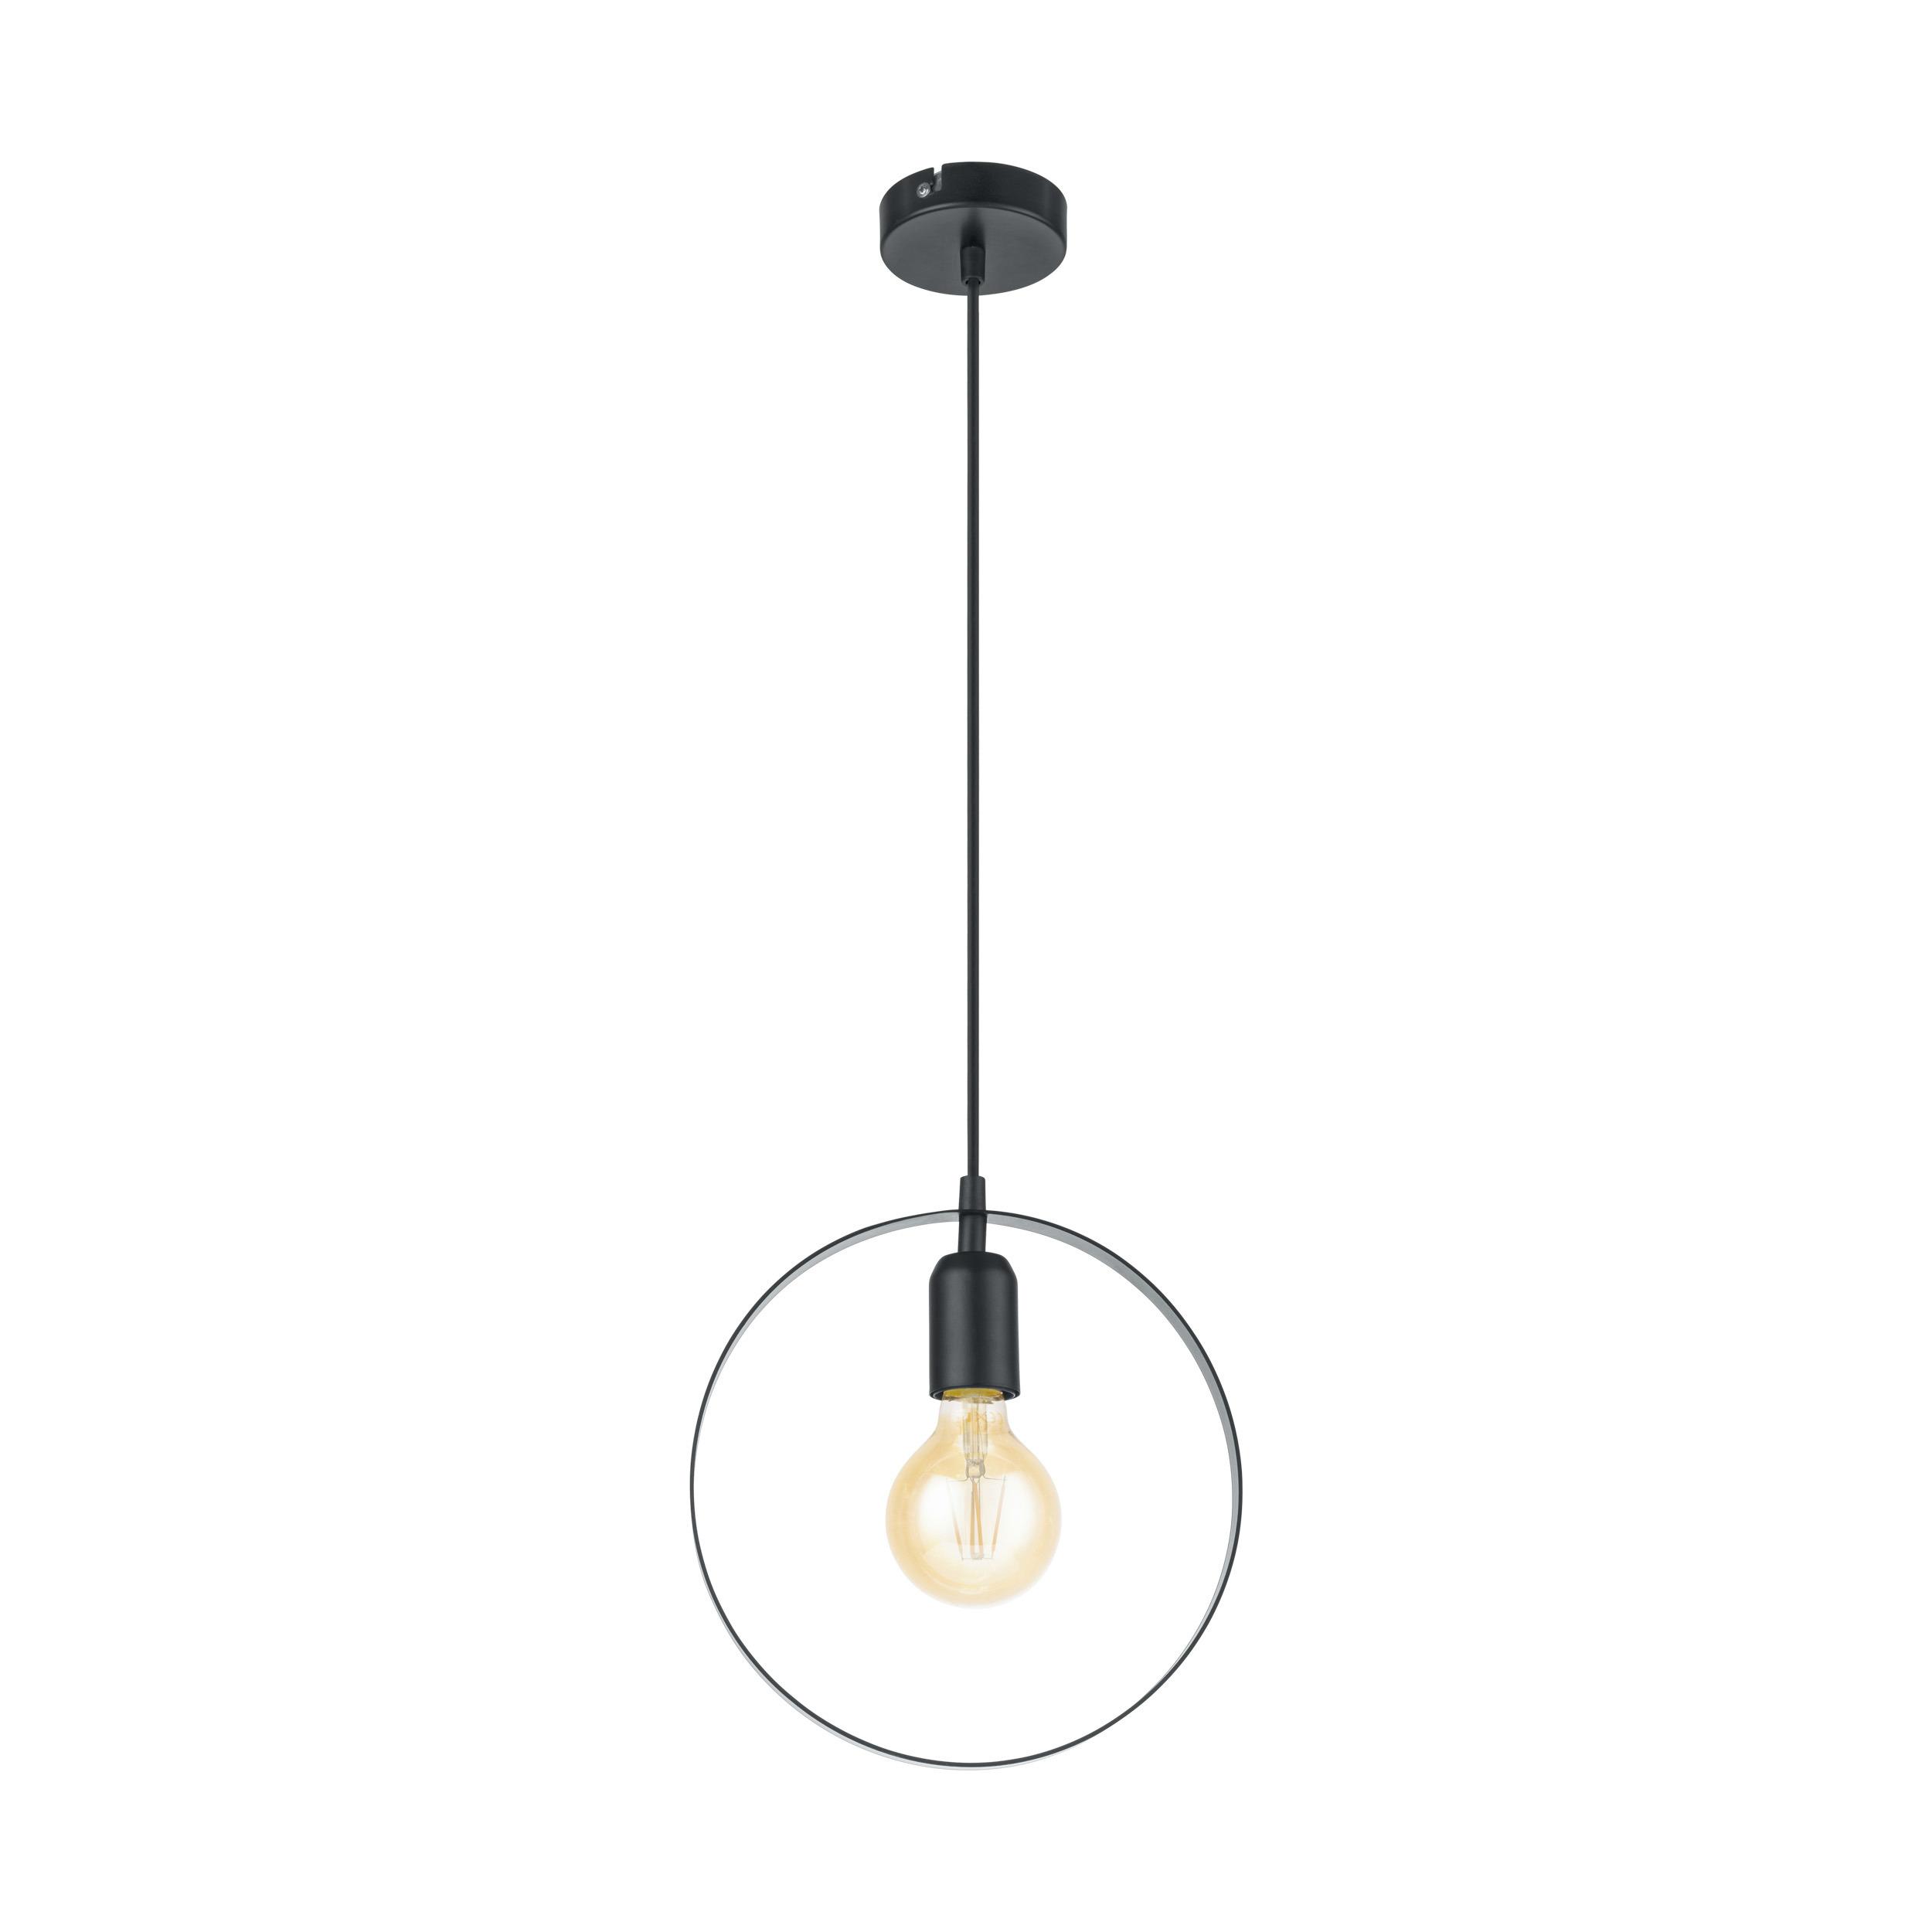 Eglo Bedington Hanglamp 1-lichts Zwart 25 cm